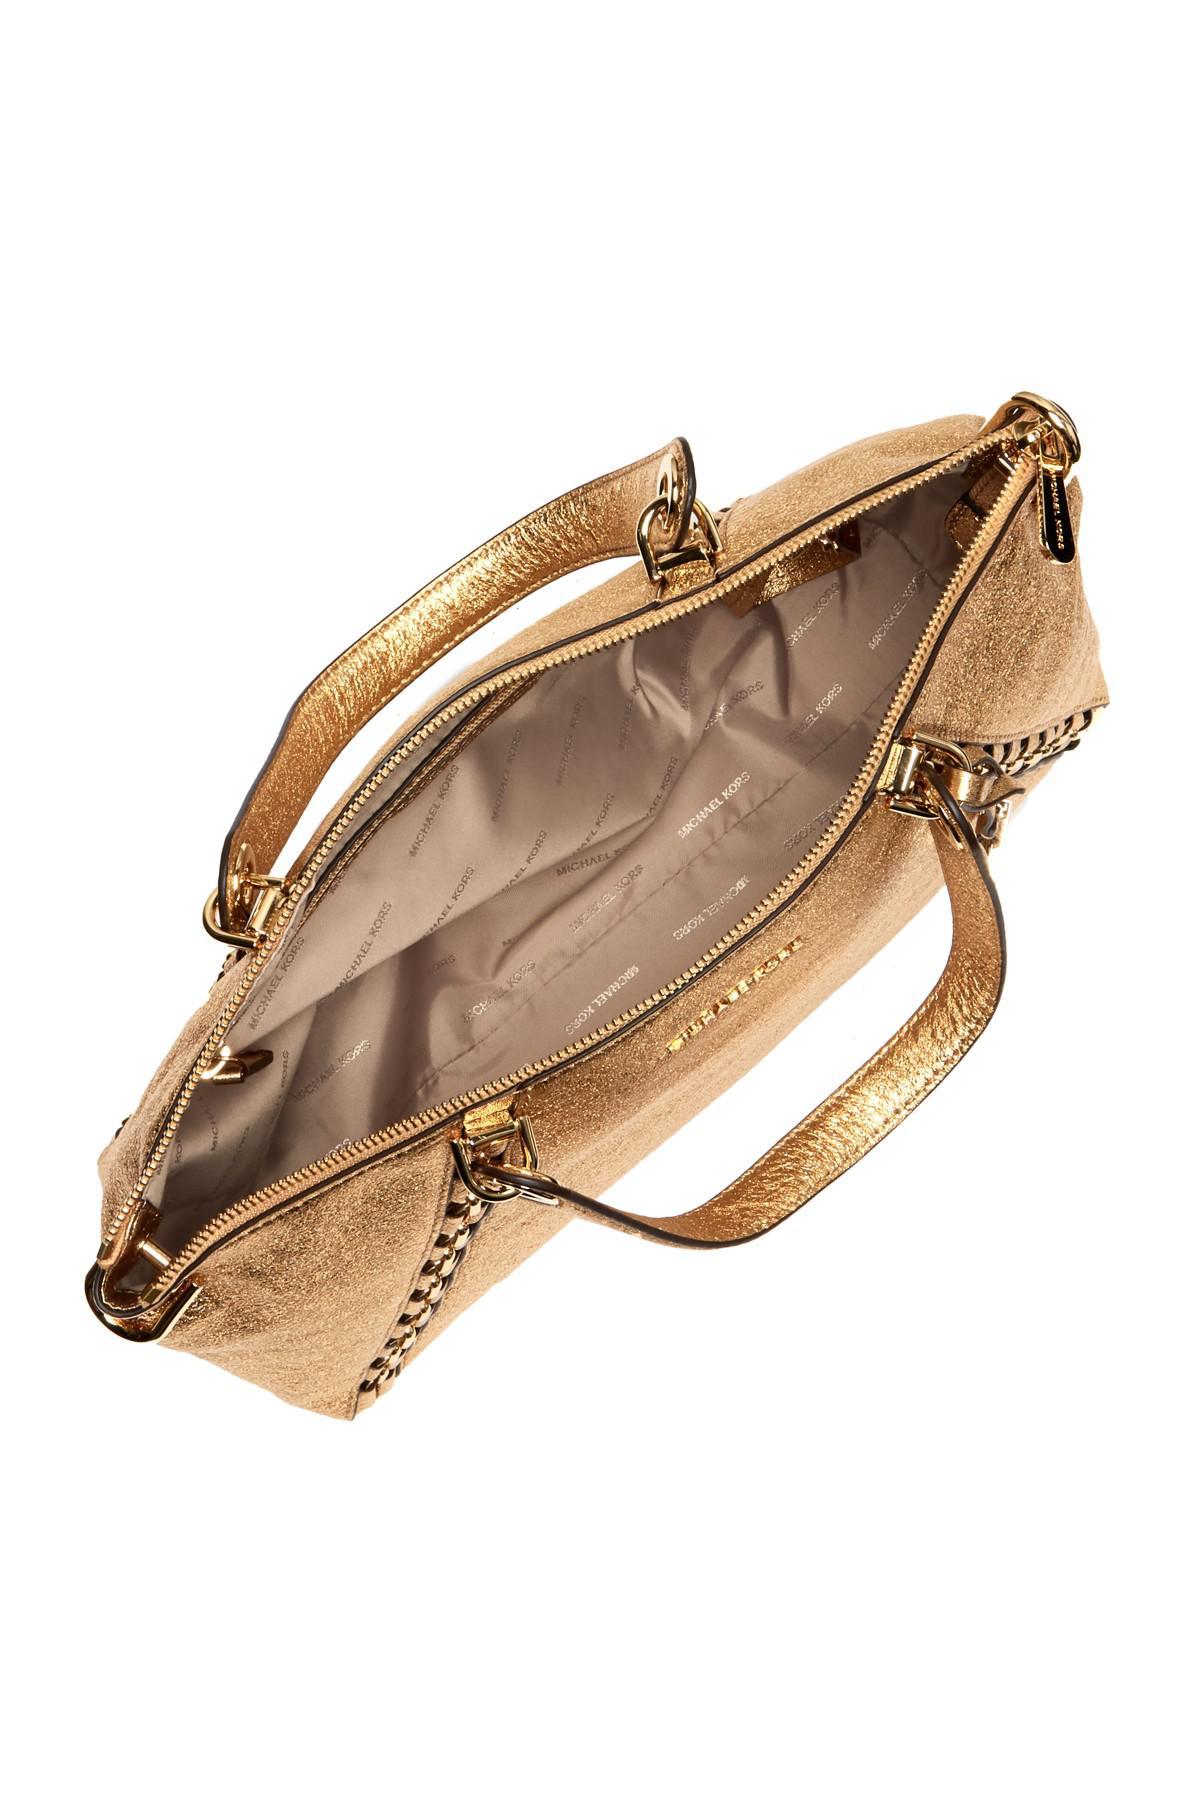 9db871b609fe5a ... ireland lyst michael michael kors chelsea medium crackled leather tote  in gray 15847 70fff